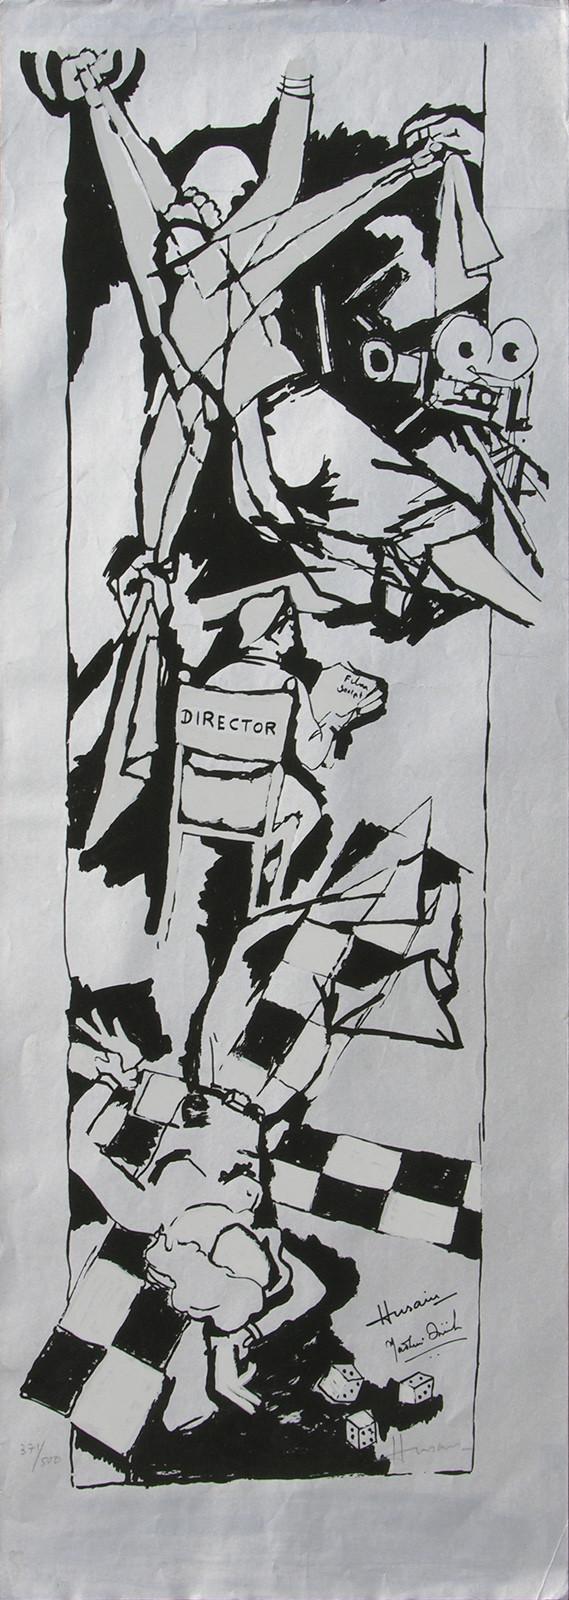 Yeh kaun sa modh hai umar ka - X by M F Husain, Expressionism Printmaking, Serigraph on Paper, Gray color